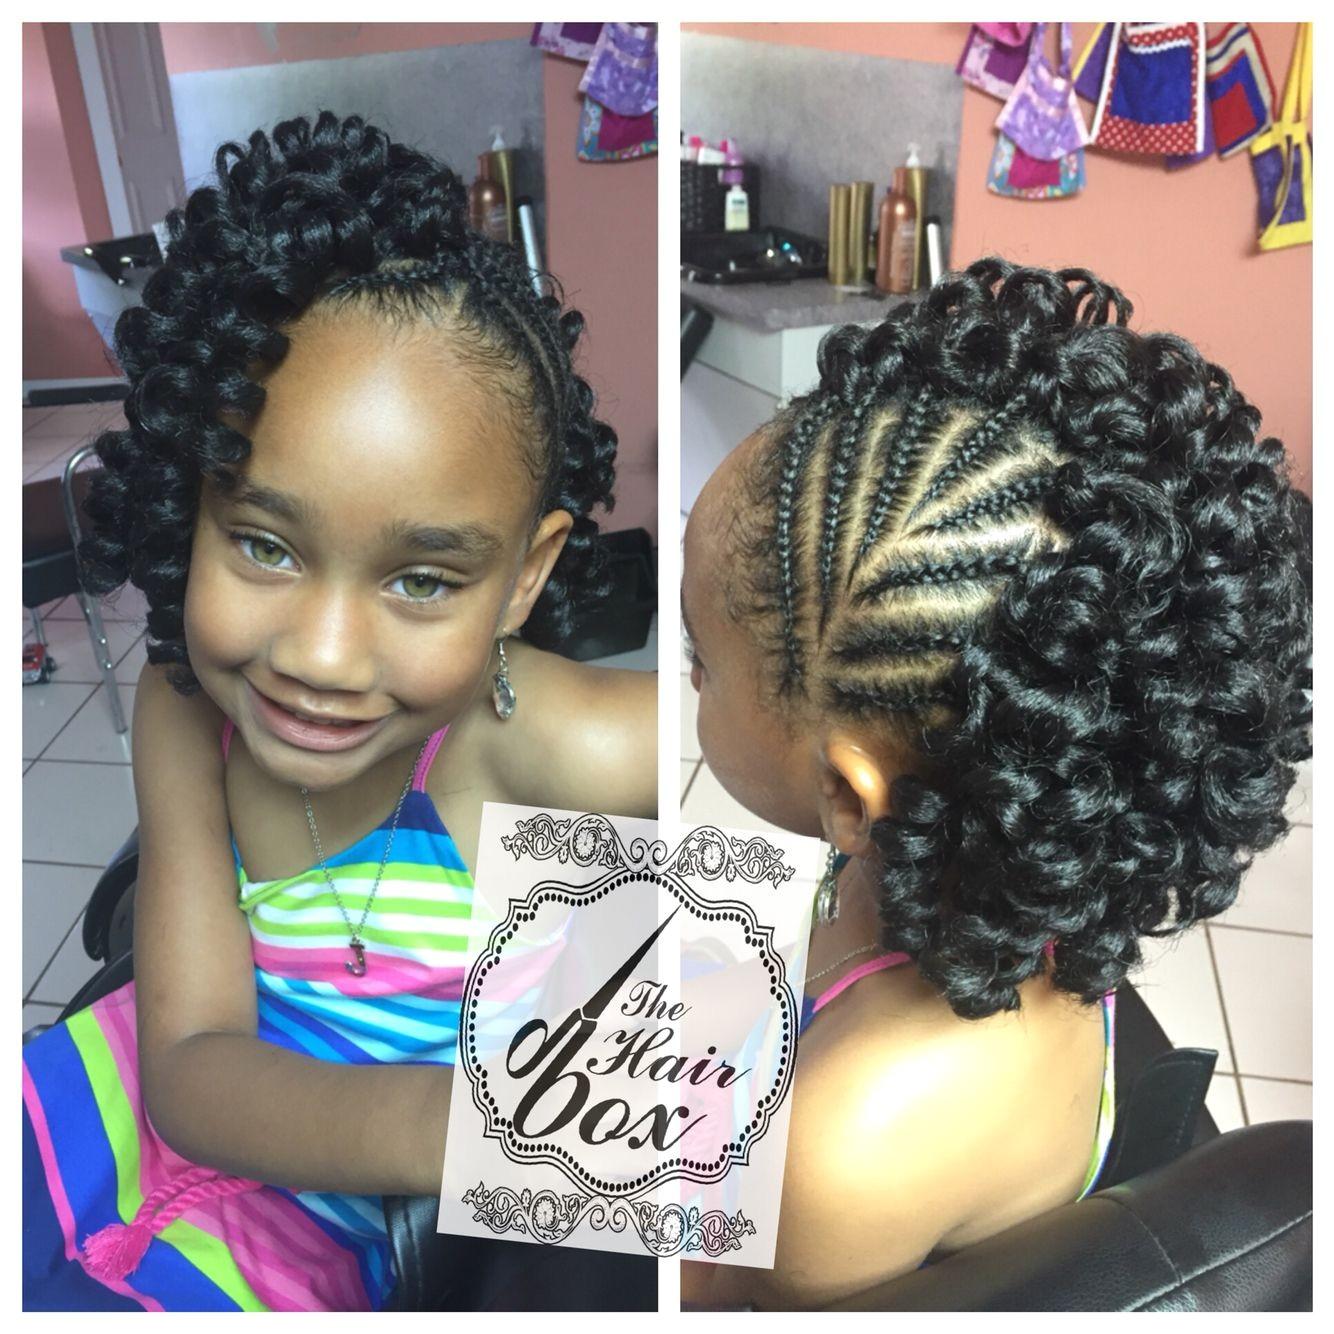 Crochet braids for little girls